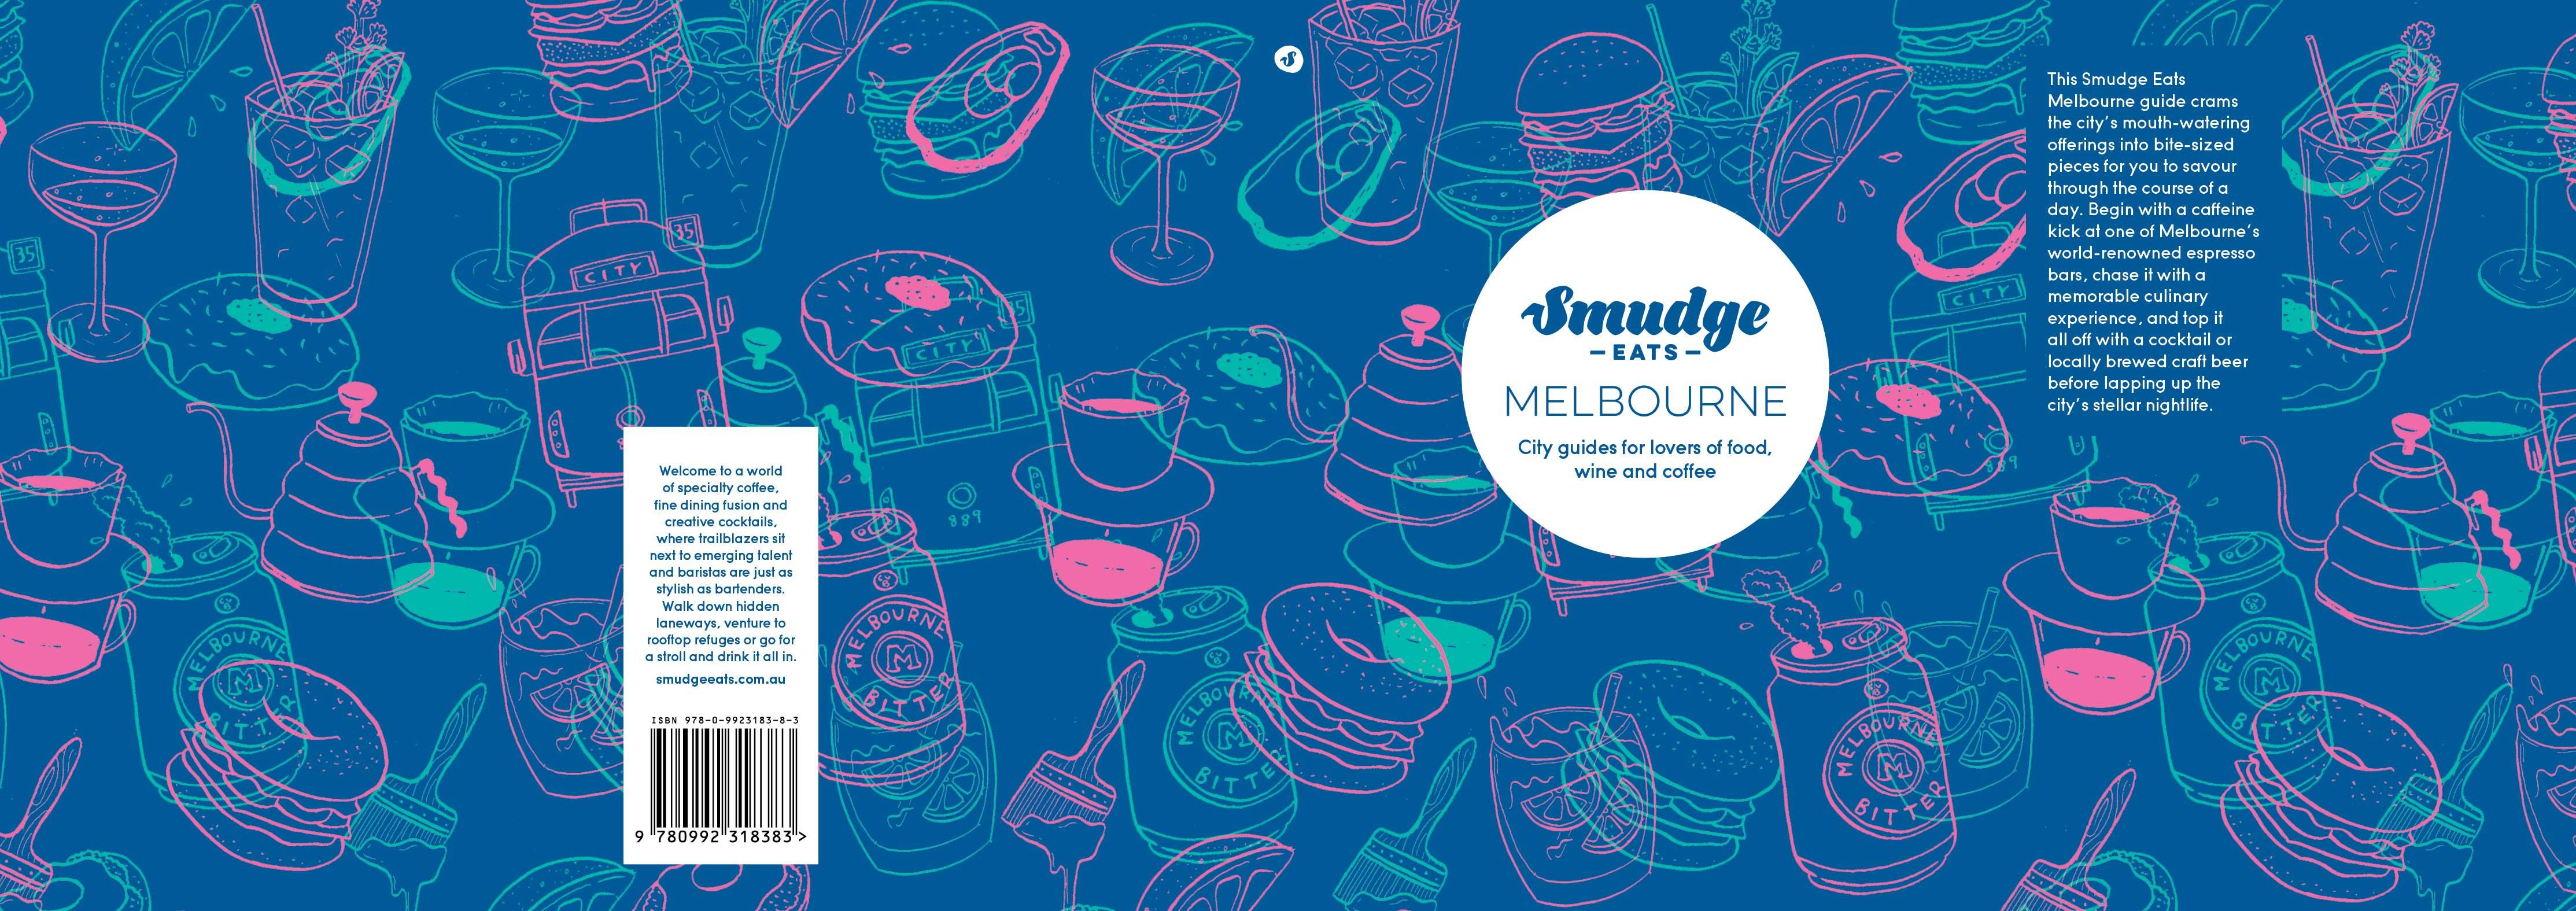 Smudge-Eats-Melbourne-Front-Cover_Flat